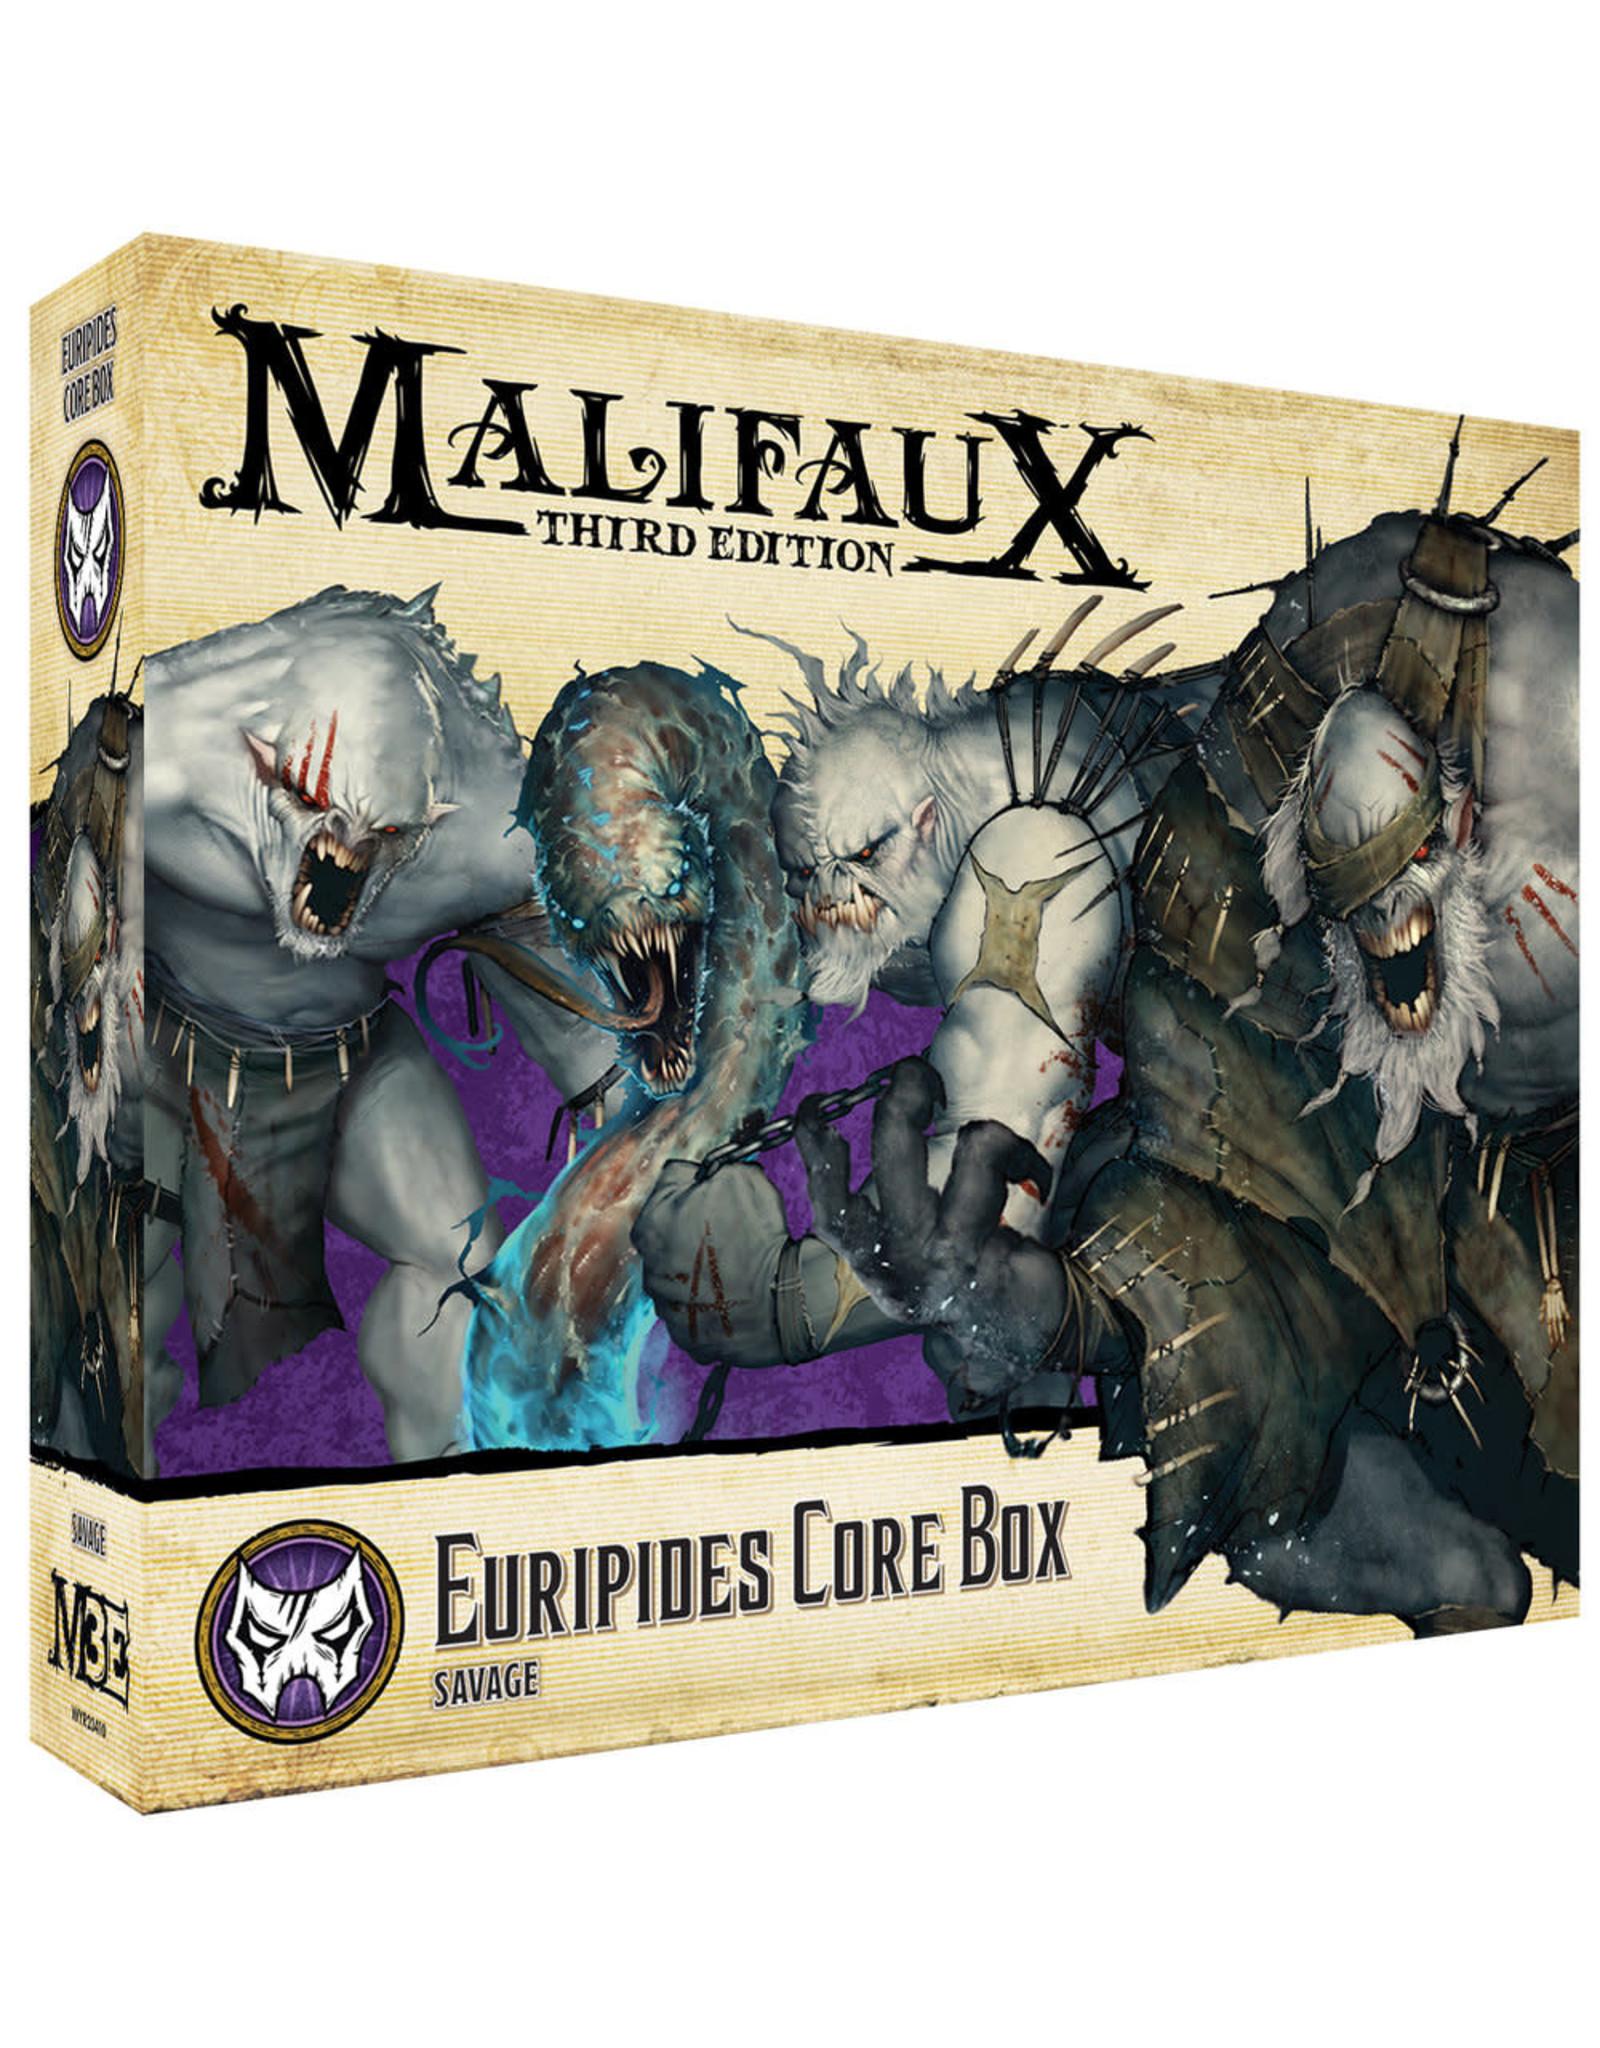 Wyrd Miniatures Euripides Core Box: Savage